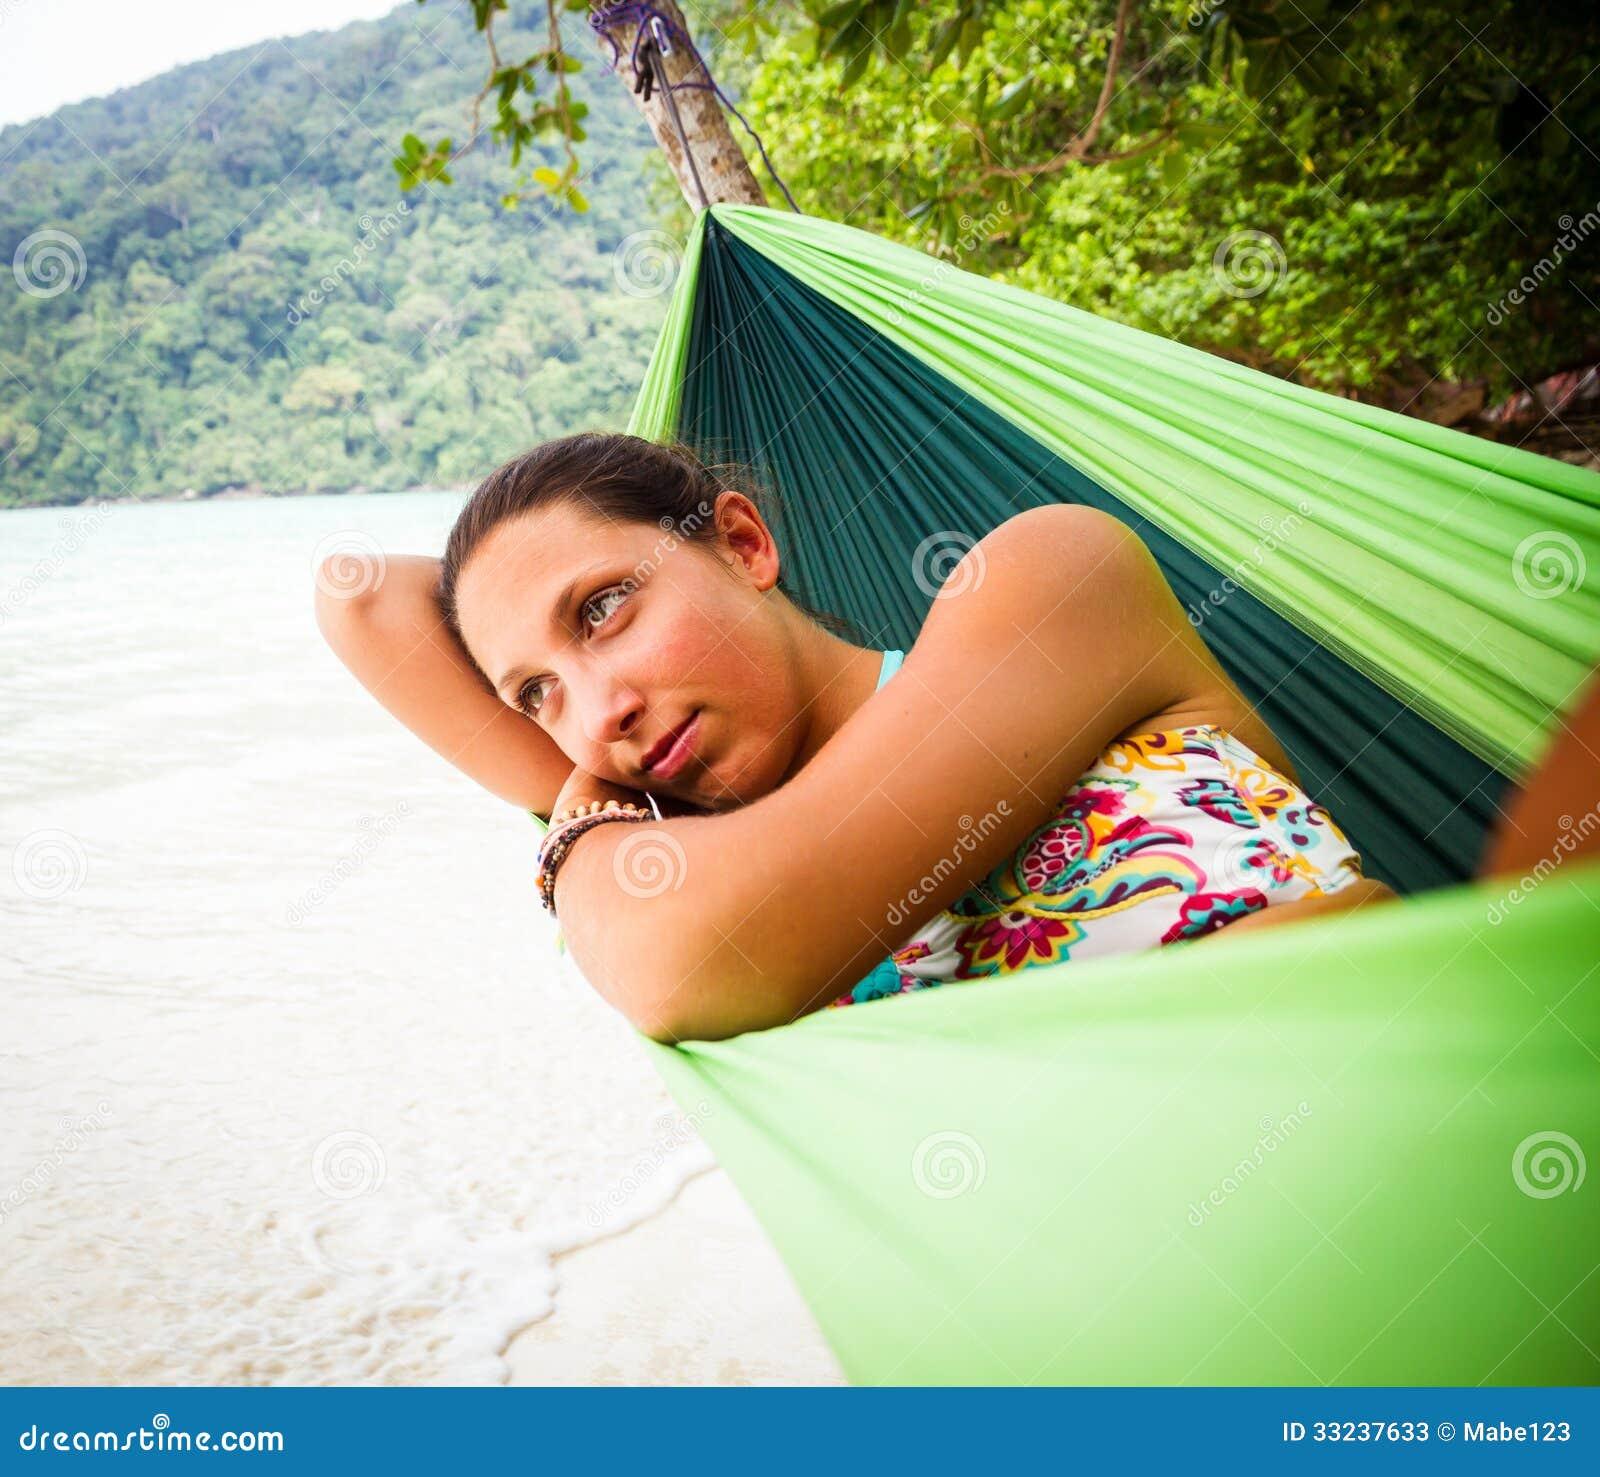 Relaxing In Hammock Stock Photos